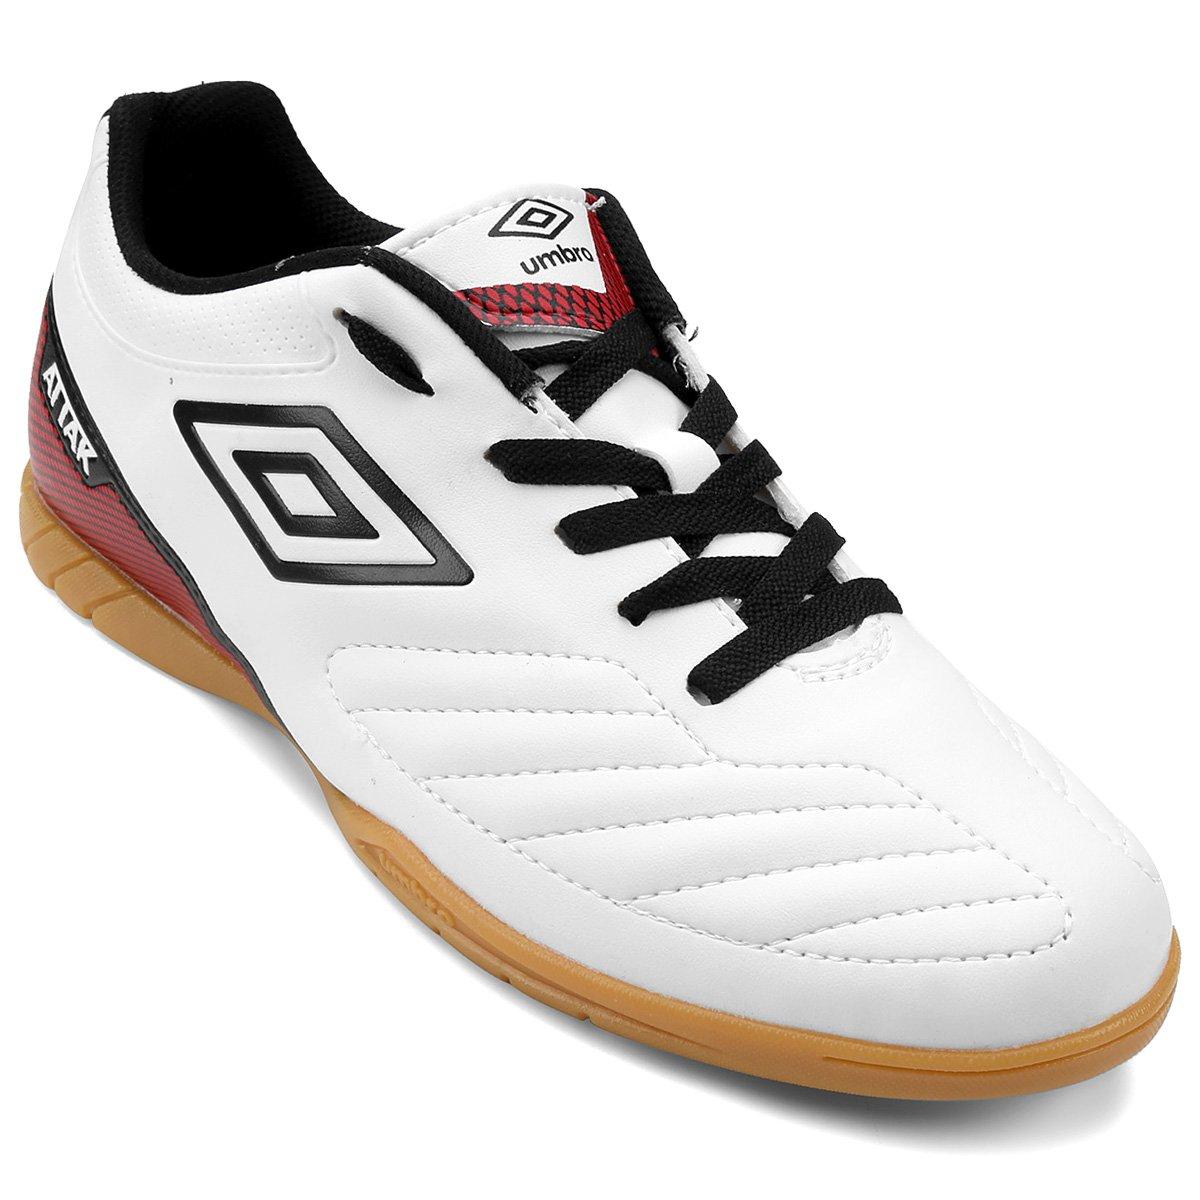 ba7f05512d6 Chuteira Futsal Umbro Attak 2 - Compre Agora